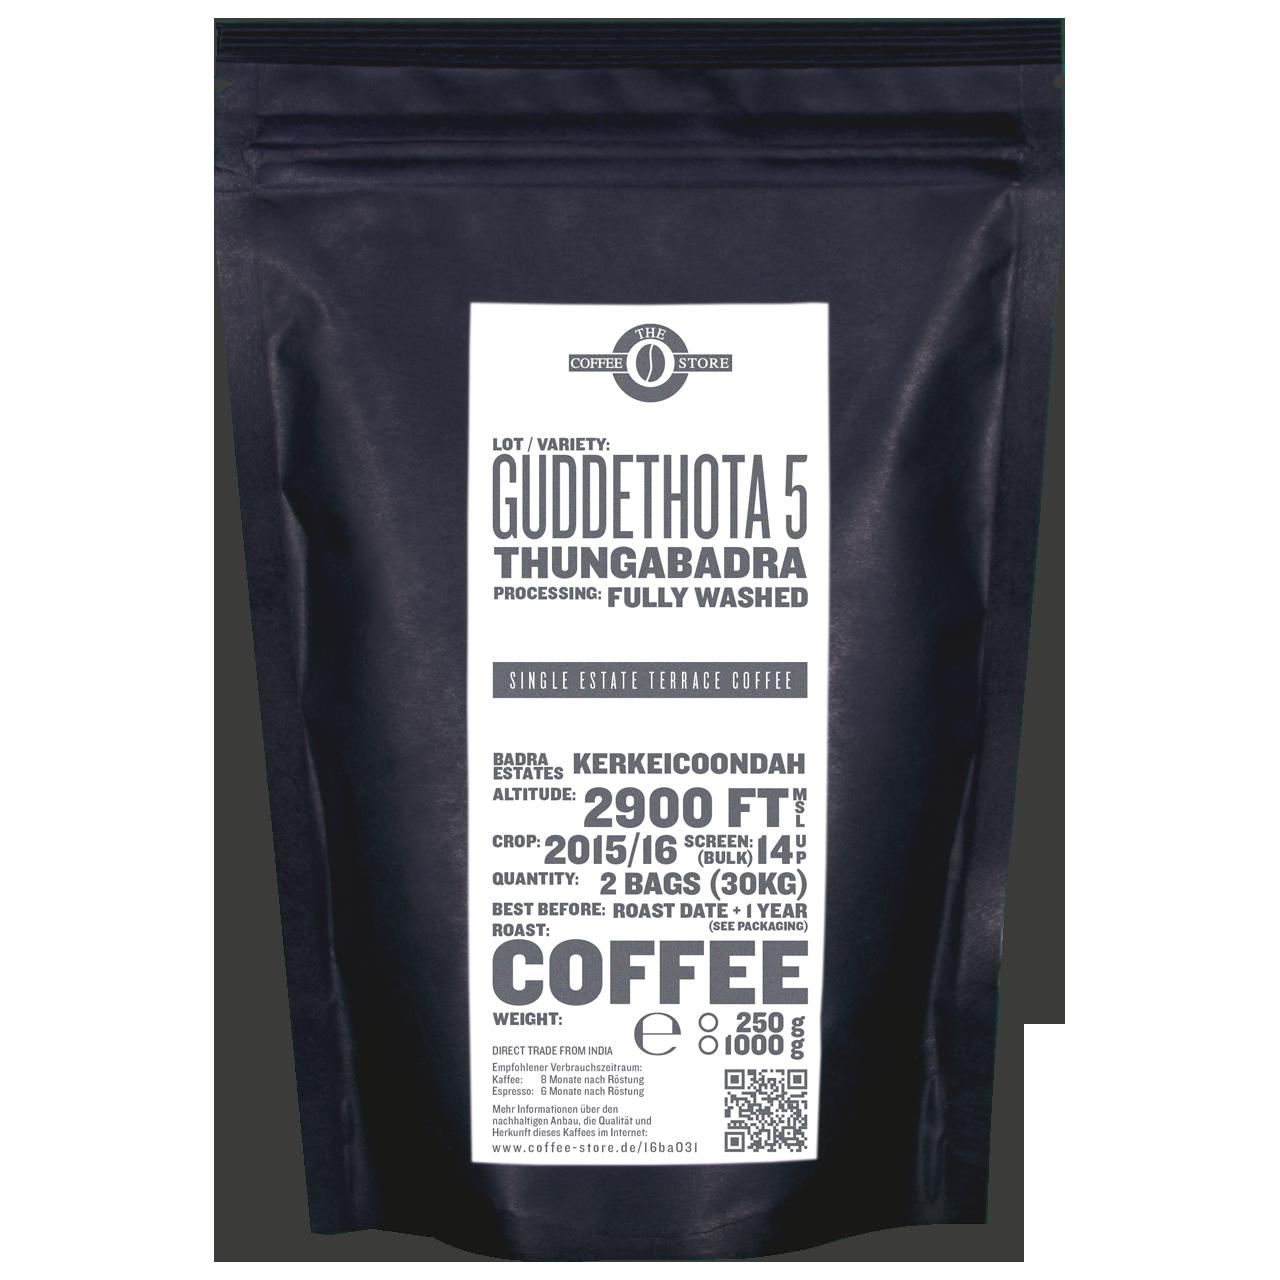 Guddethota - 5, Thungabadra - Kaffeeröstung